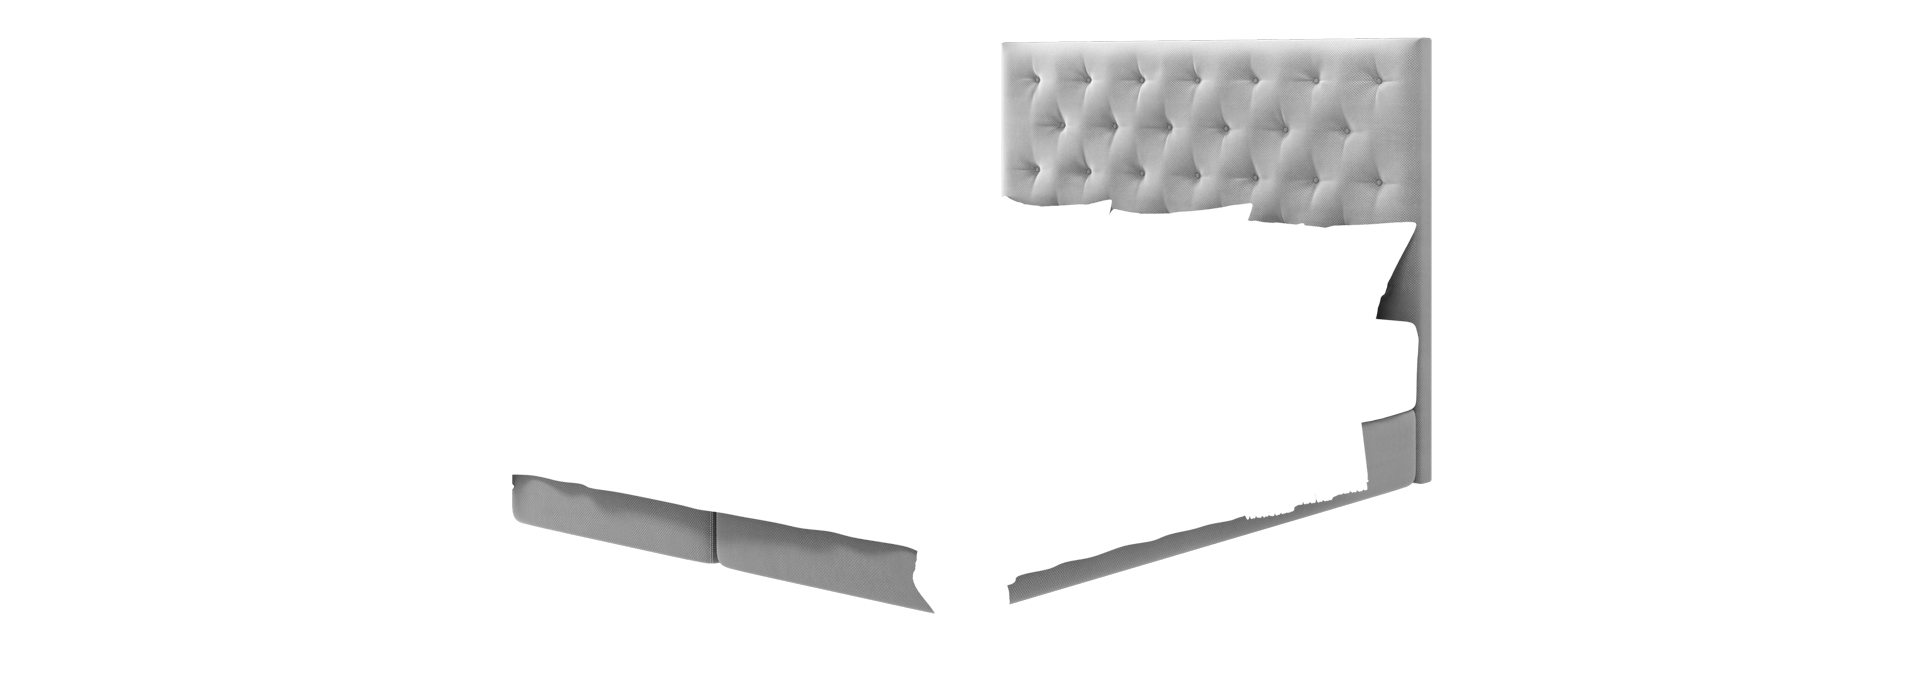 Естер 1.6 ліжко box spring - маска 2